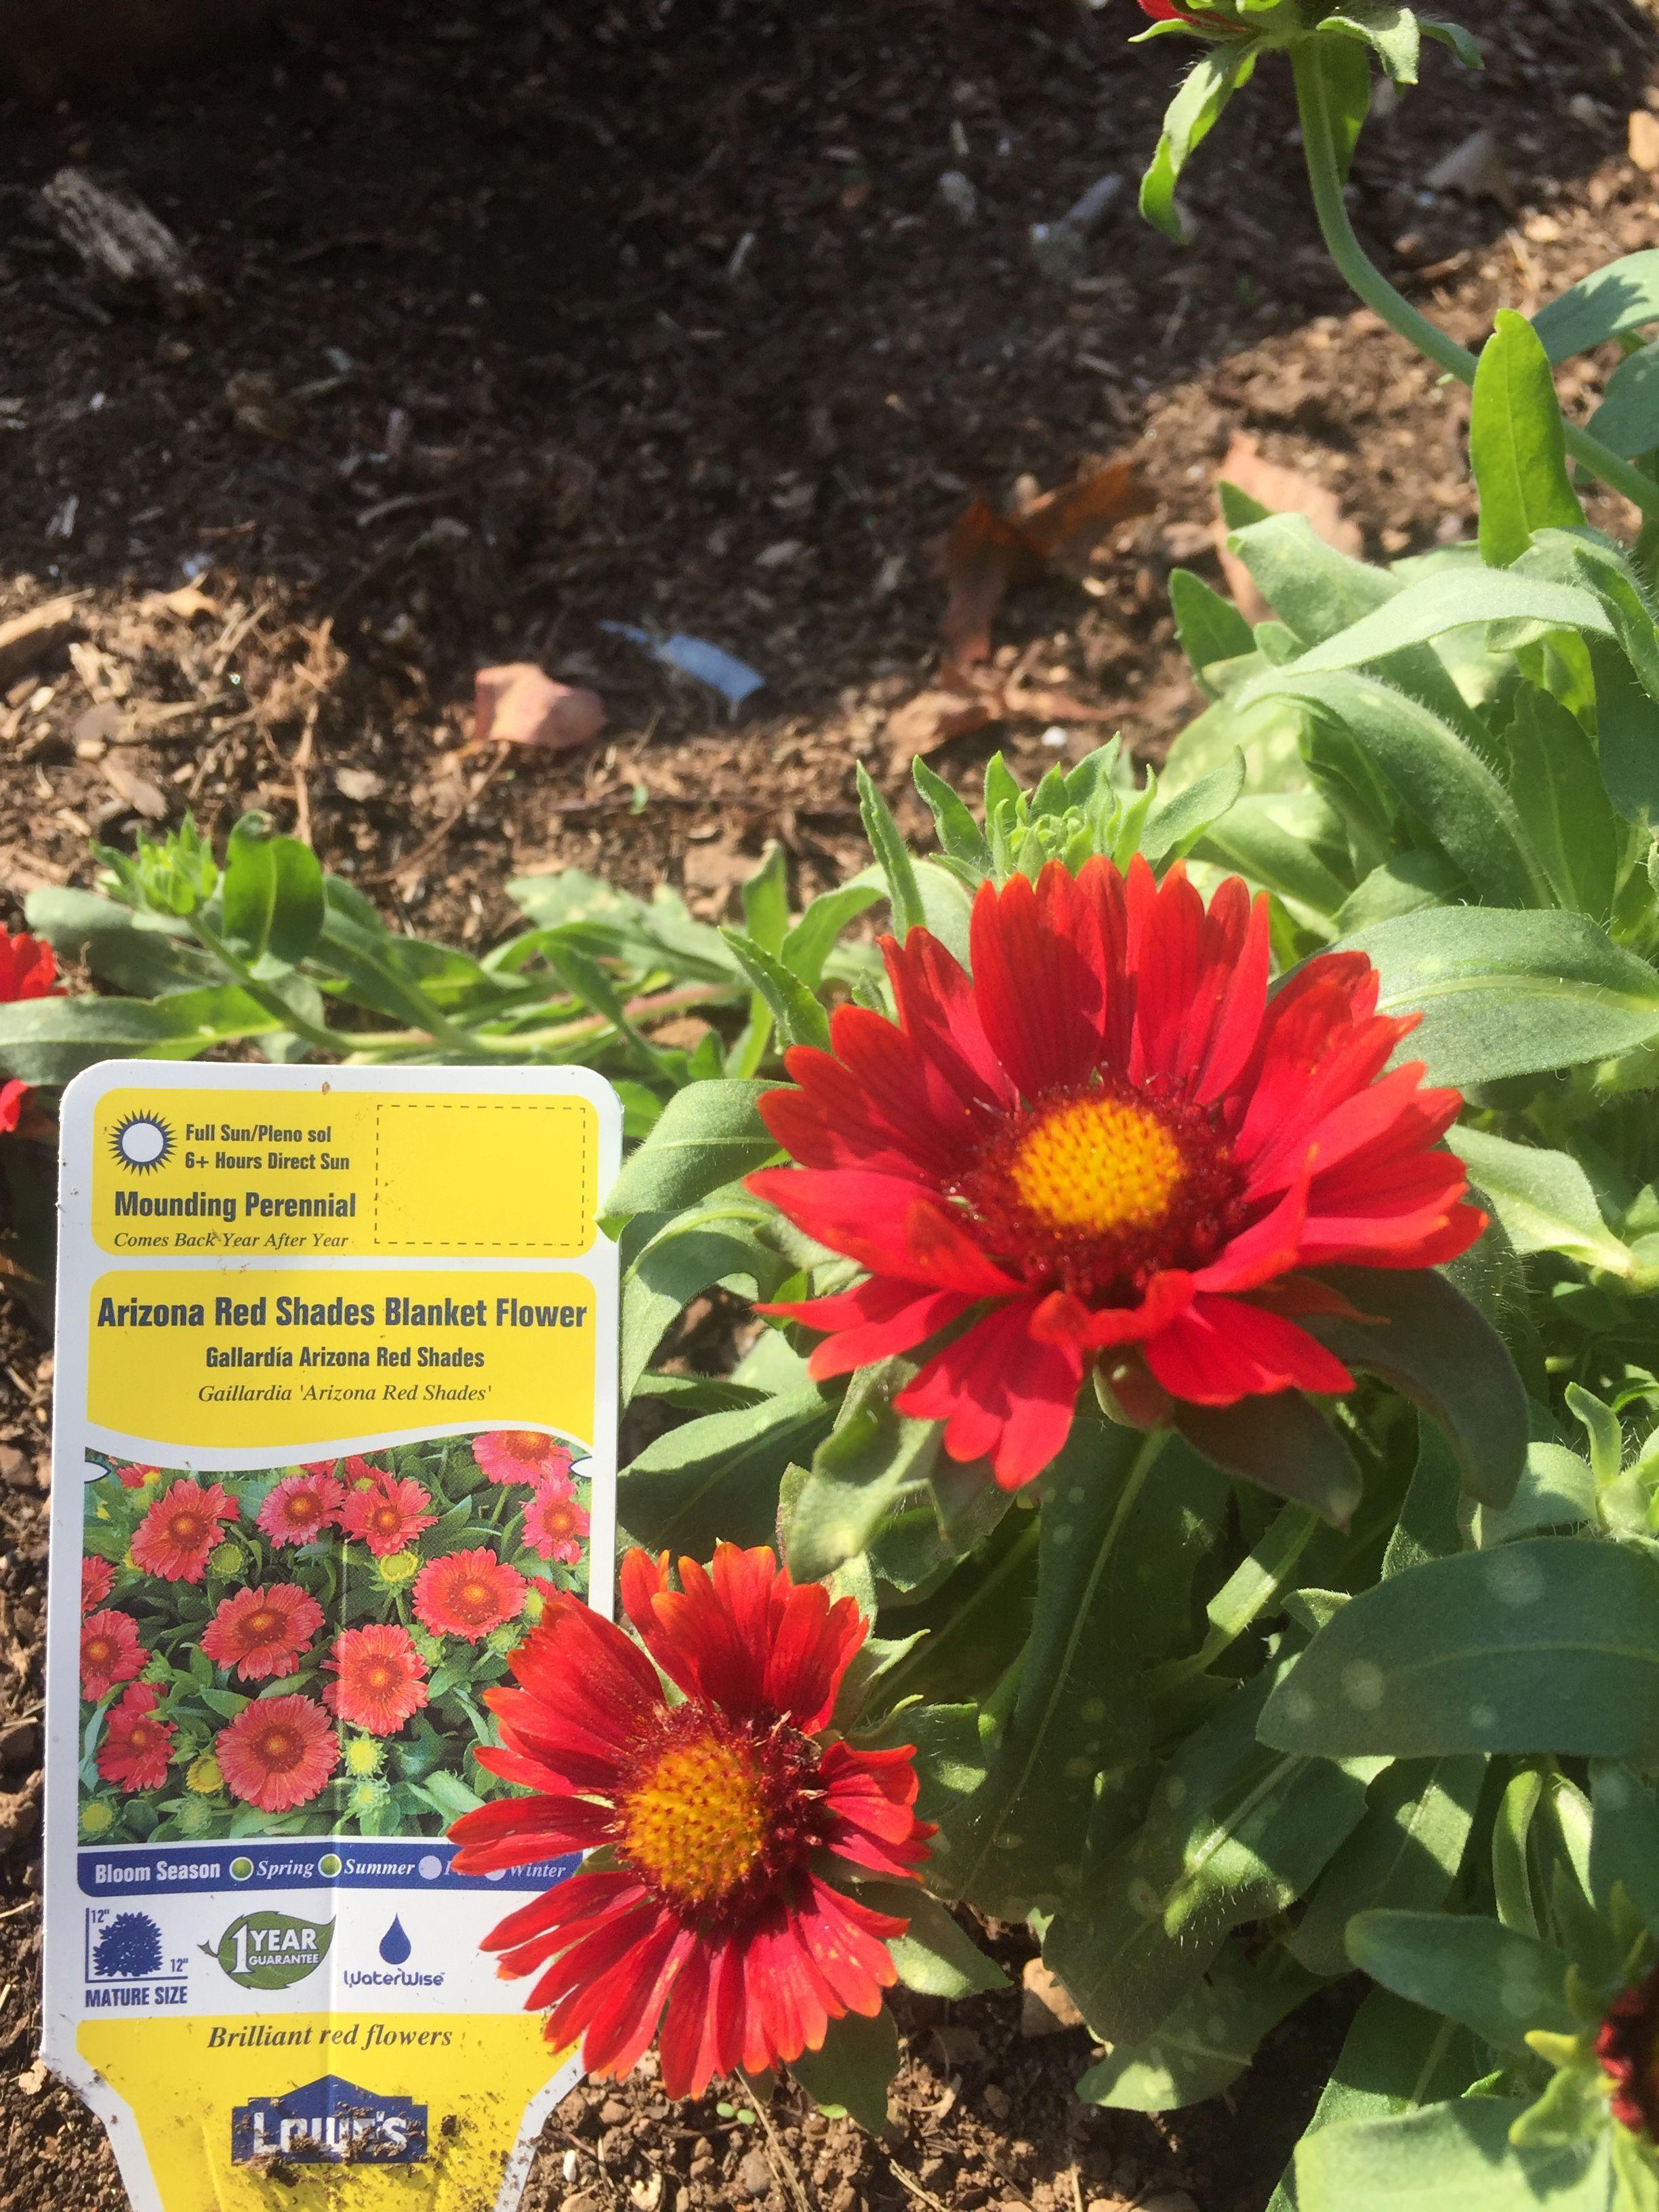 Edible FlowersBachelor ButtonsTall PlantsFlower GardeningDrought TolerantPlantingSeedsBowls